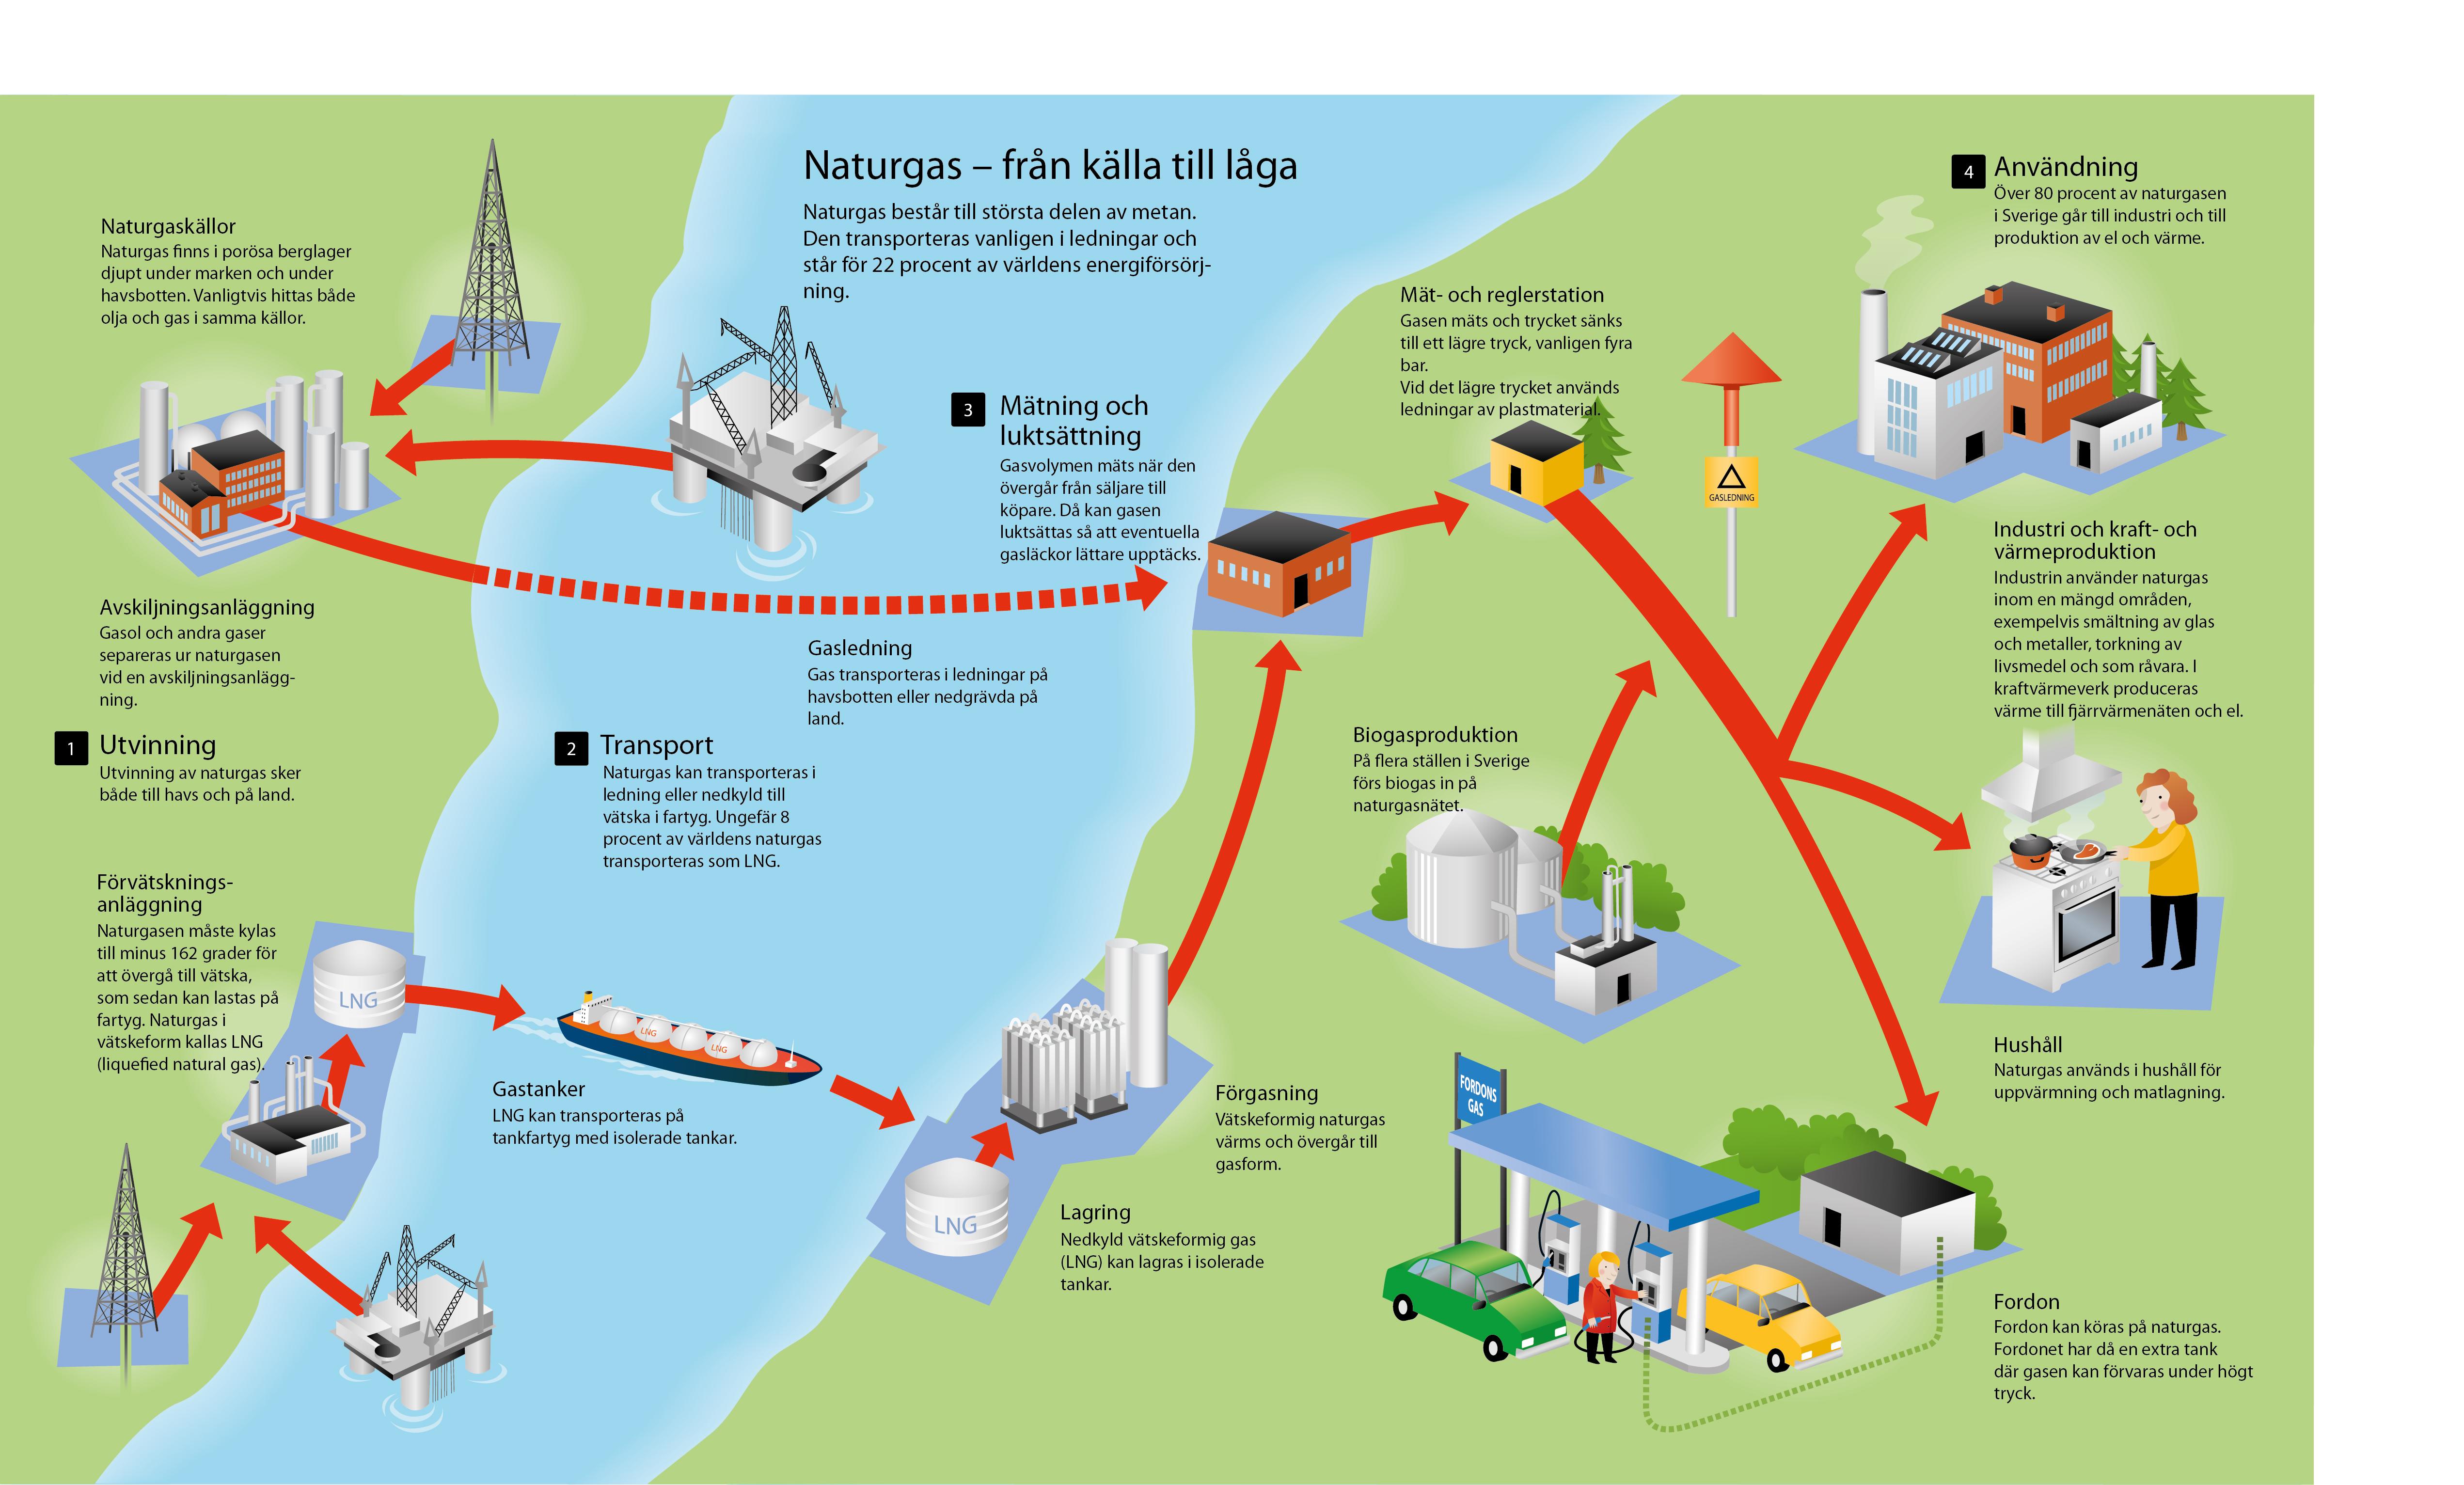 Norge ska utvinna naturgas i norr